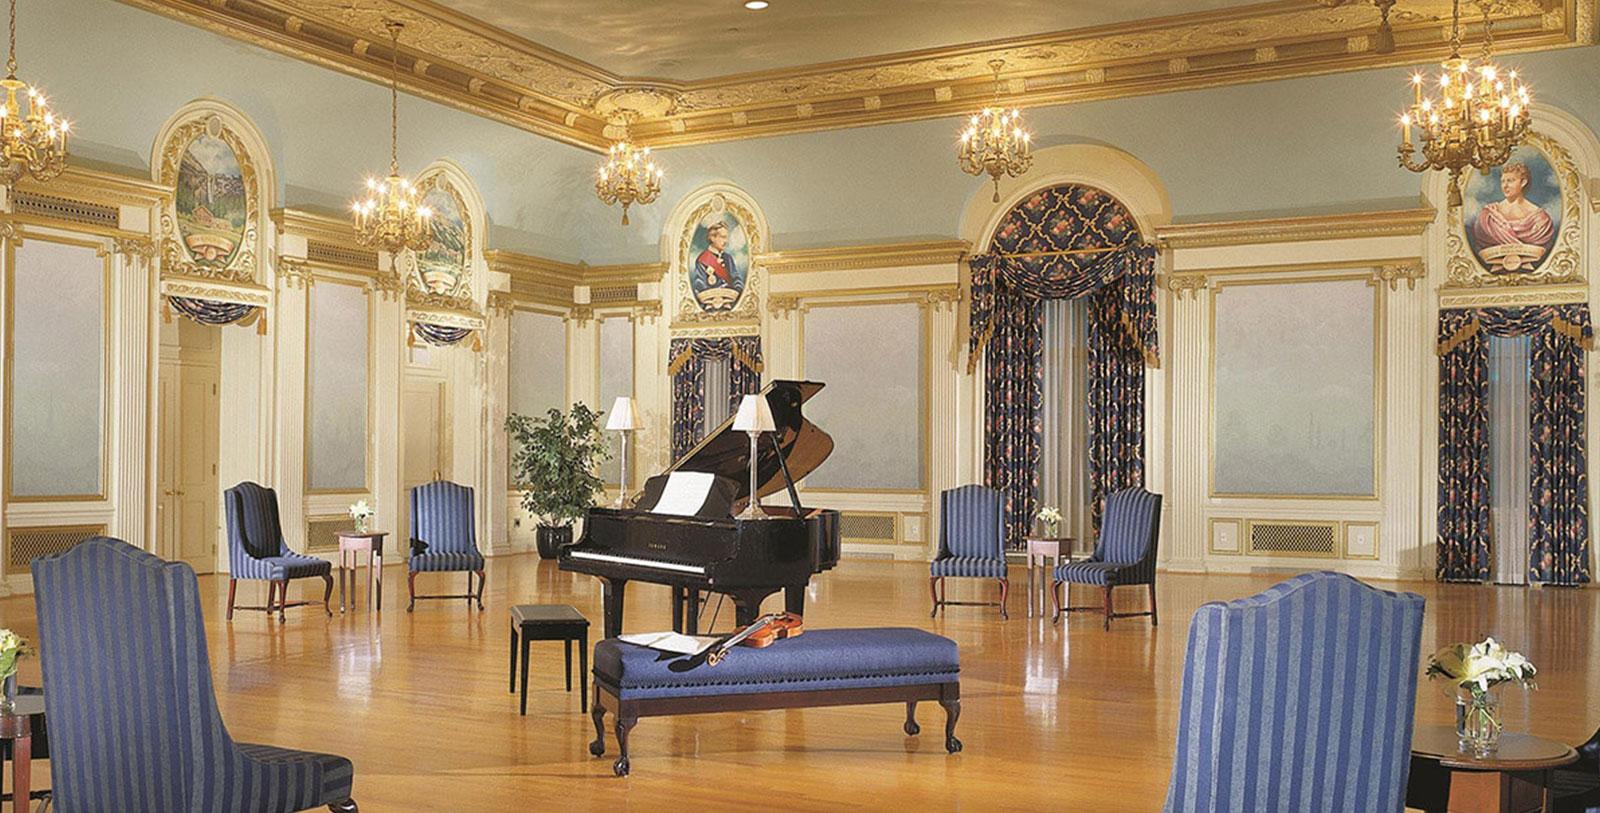 Image of Alberta Ballroom, Fairmont Palliser, 1914, Member of Historic Hotels Worldwide, in Calgary, Alberta, Weddings